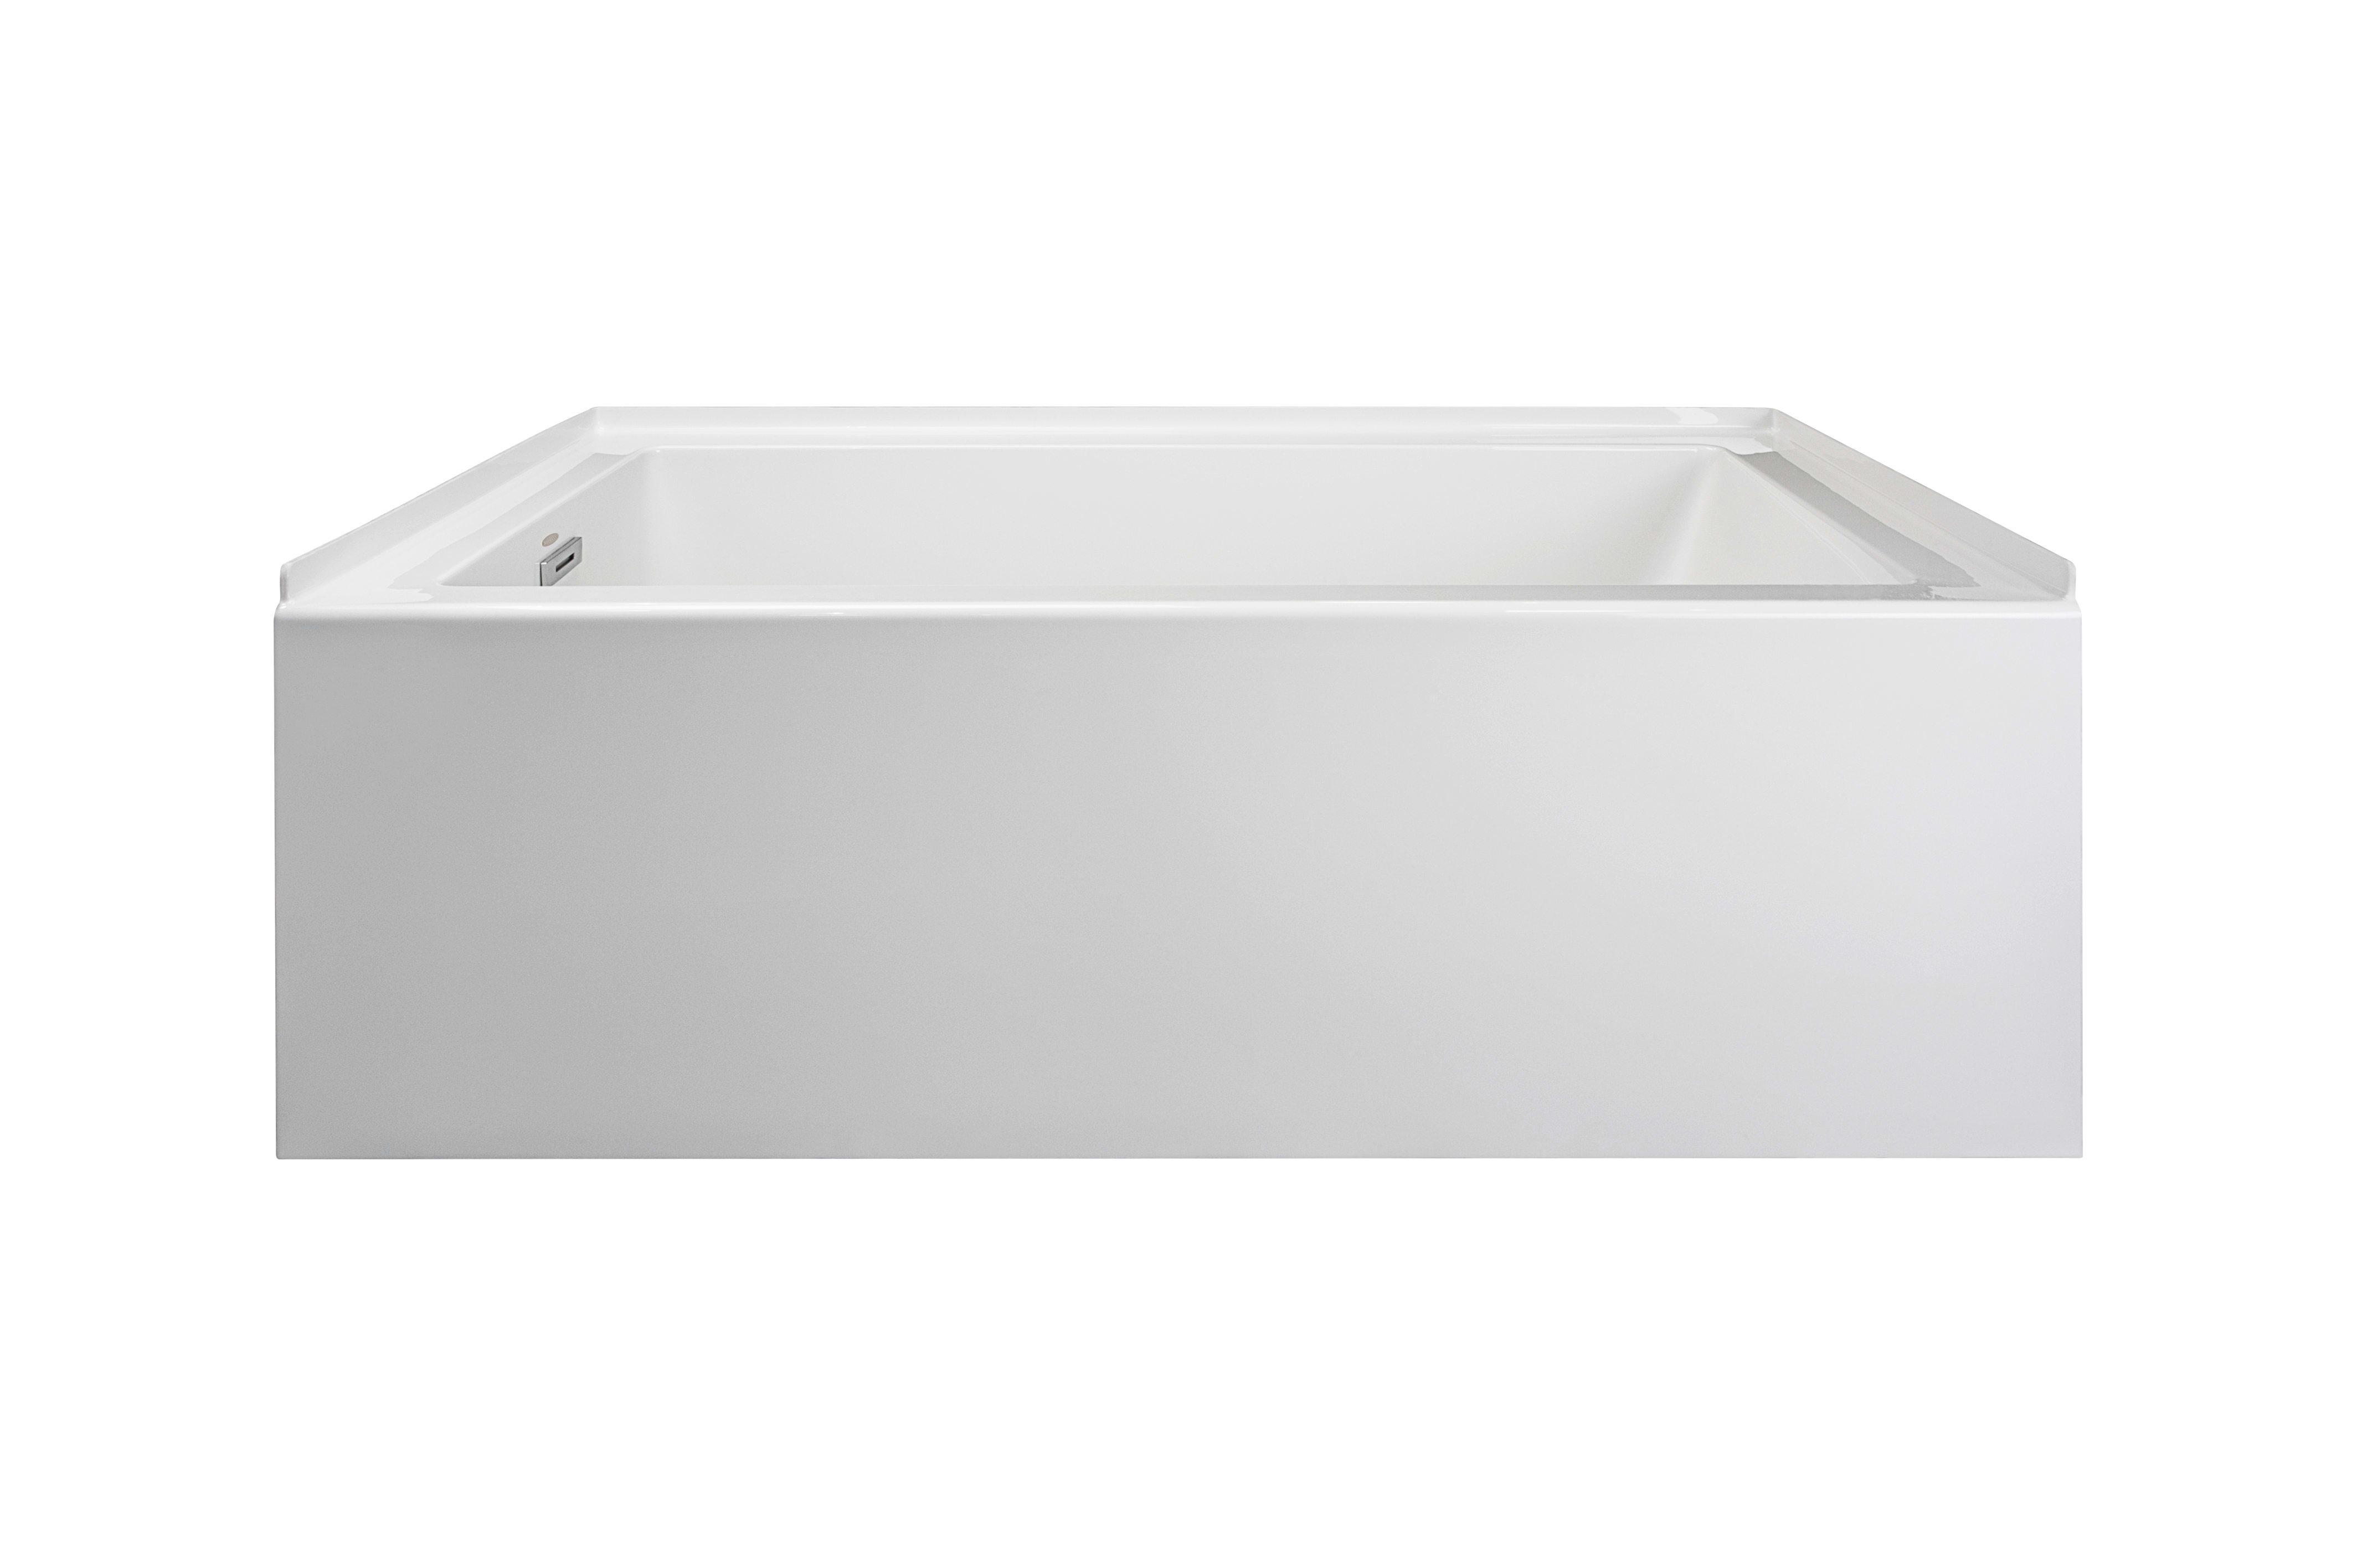 alcove enlarge data sided bathtub sf skirt baths lr r x bpodium oceania loft